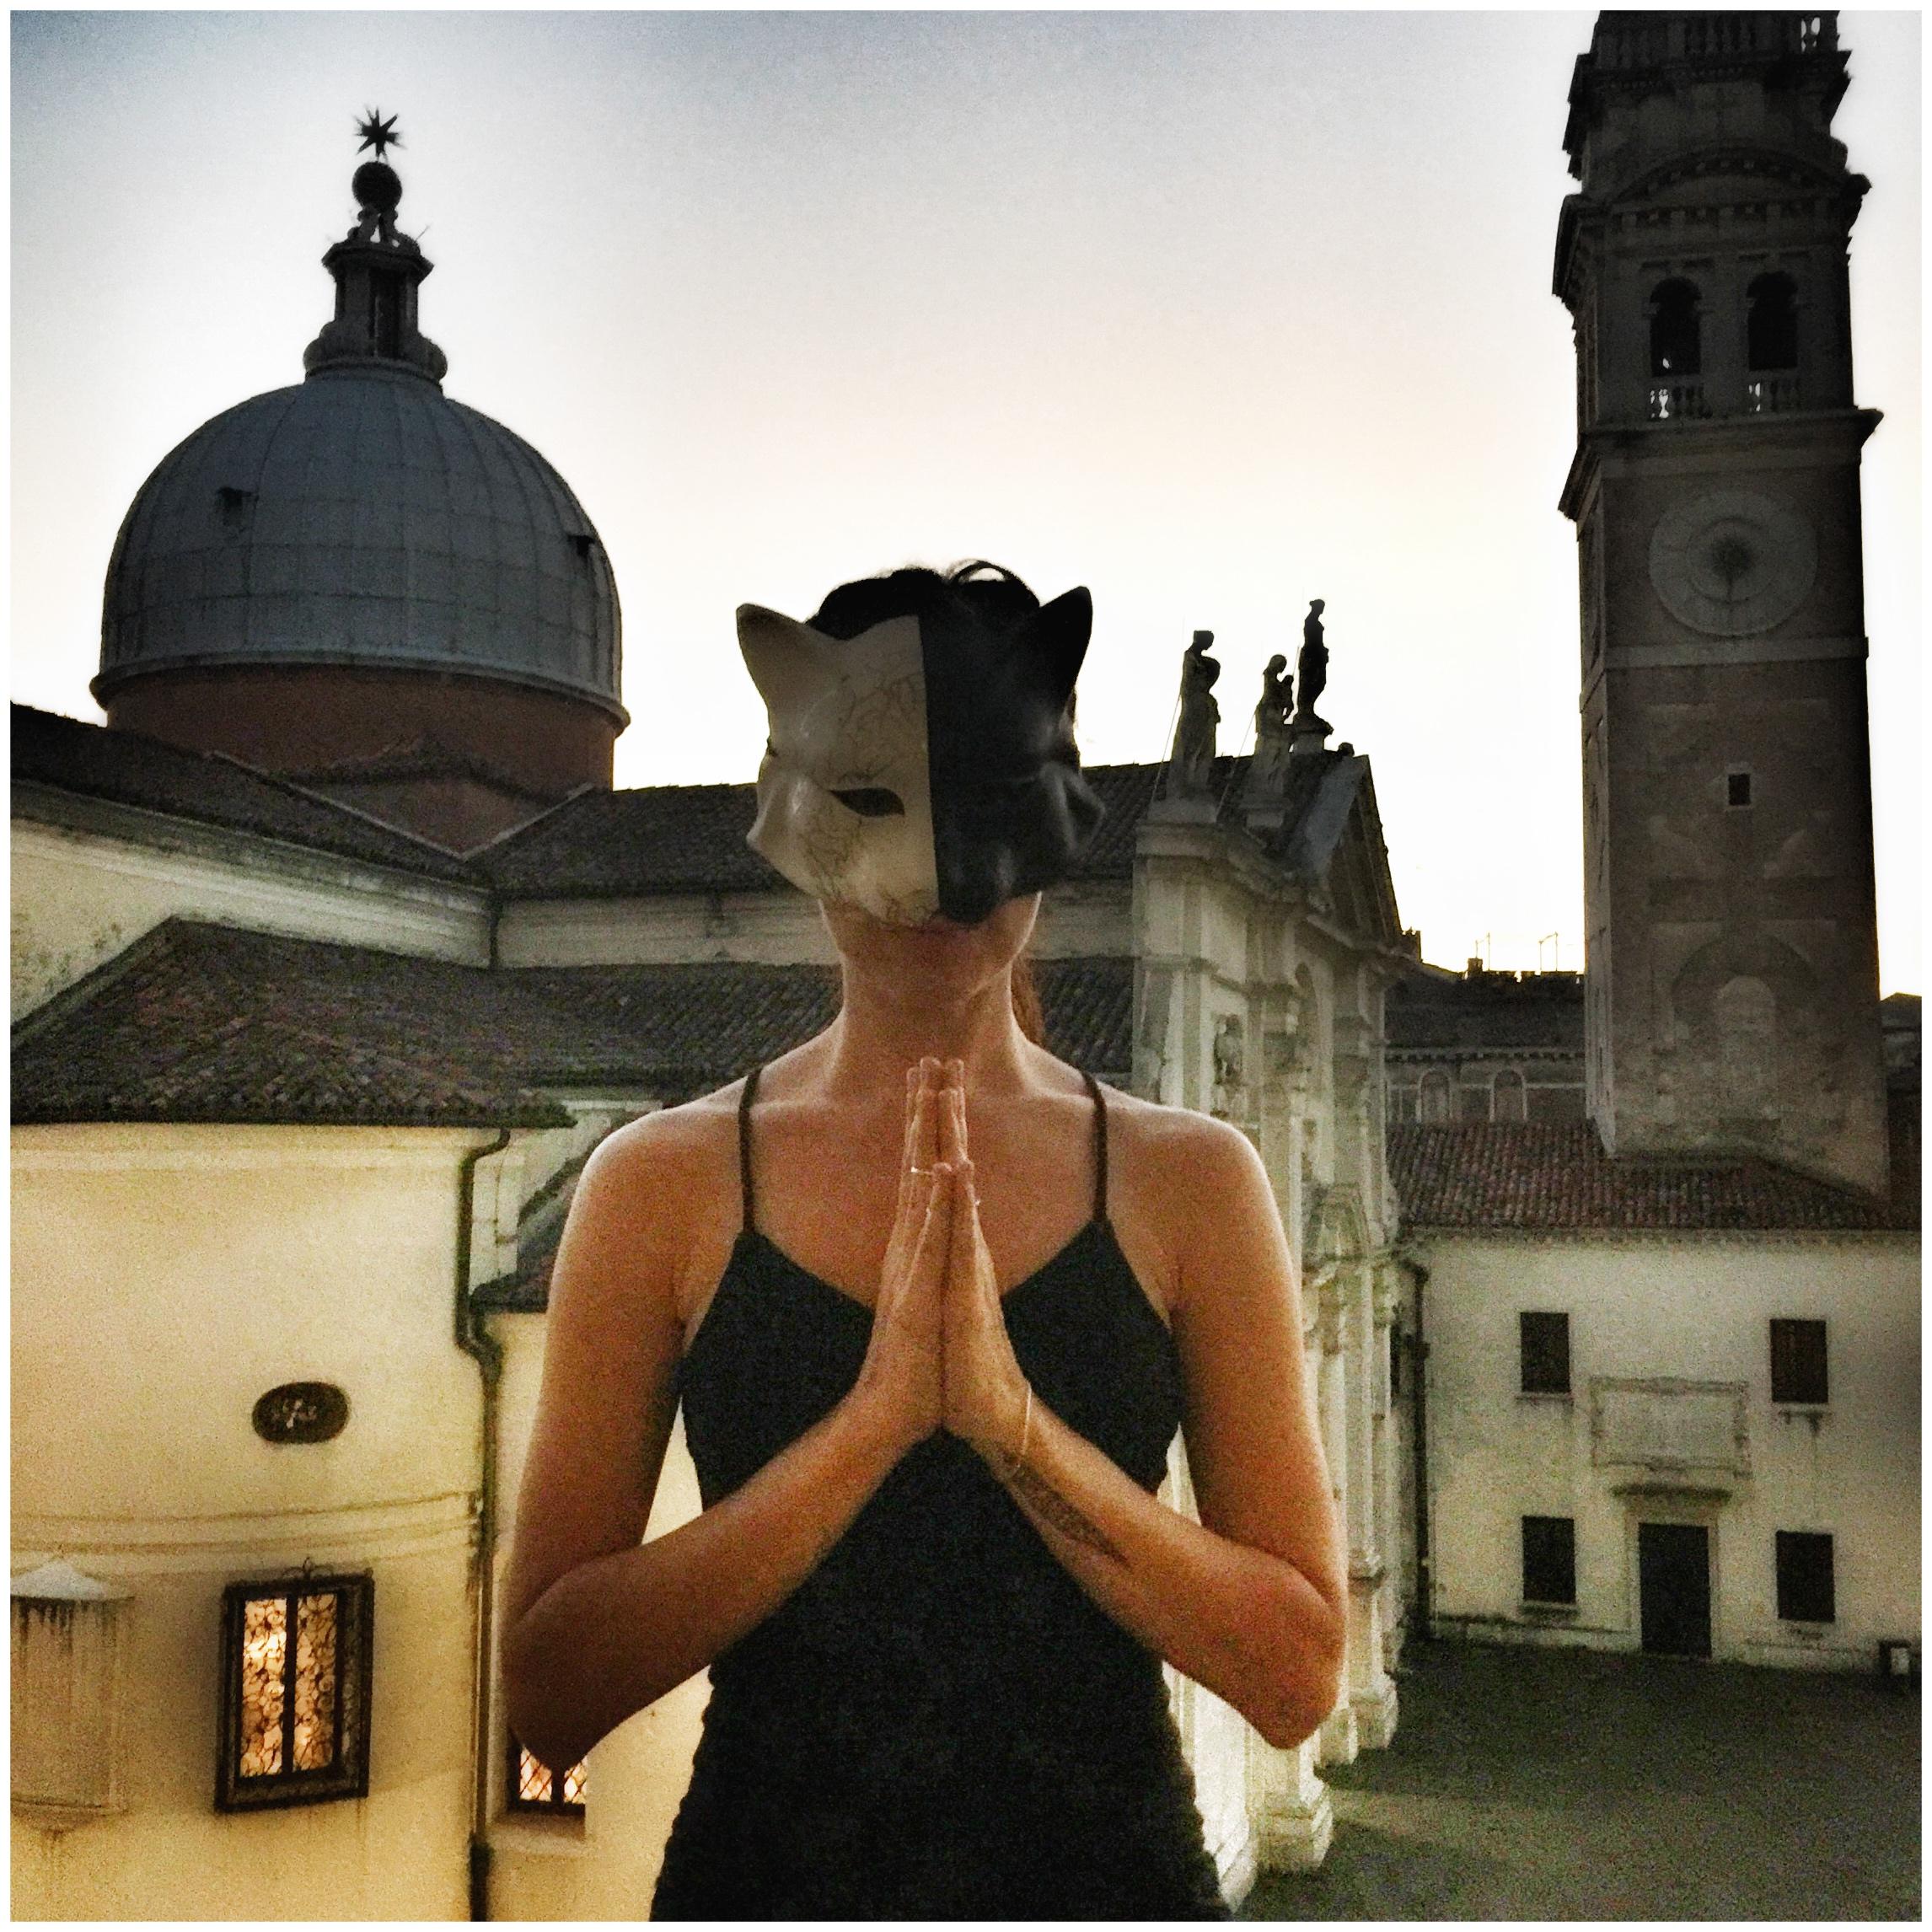 Masks in the city | EAT.PRAY.MOVE Yoga | Venice, Italy